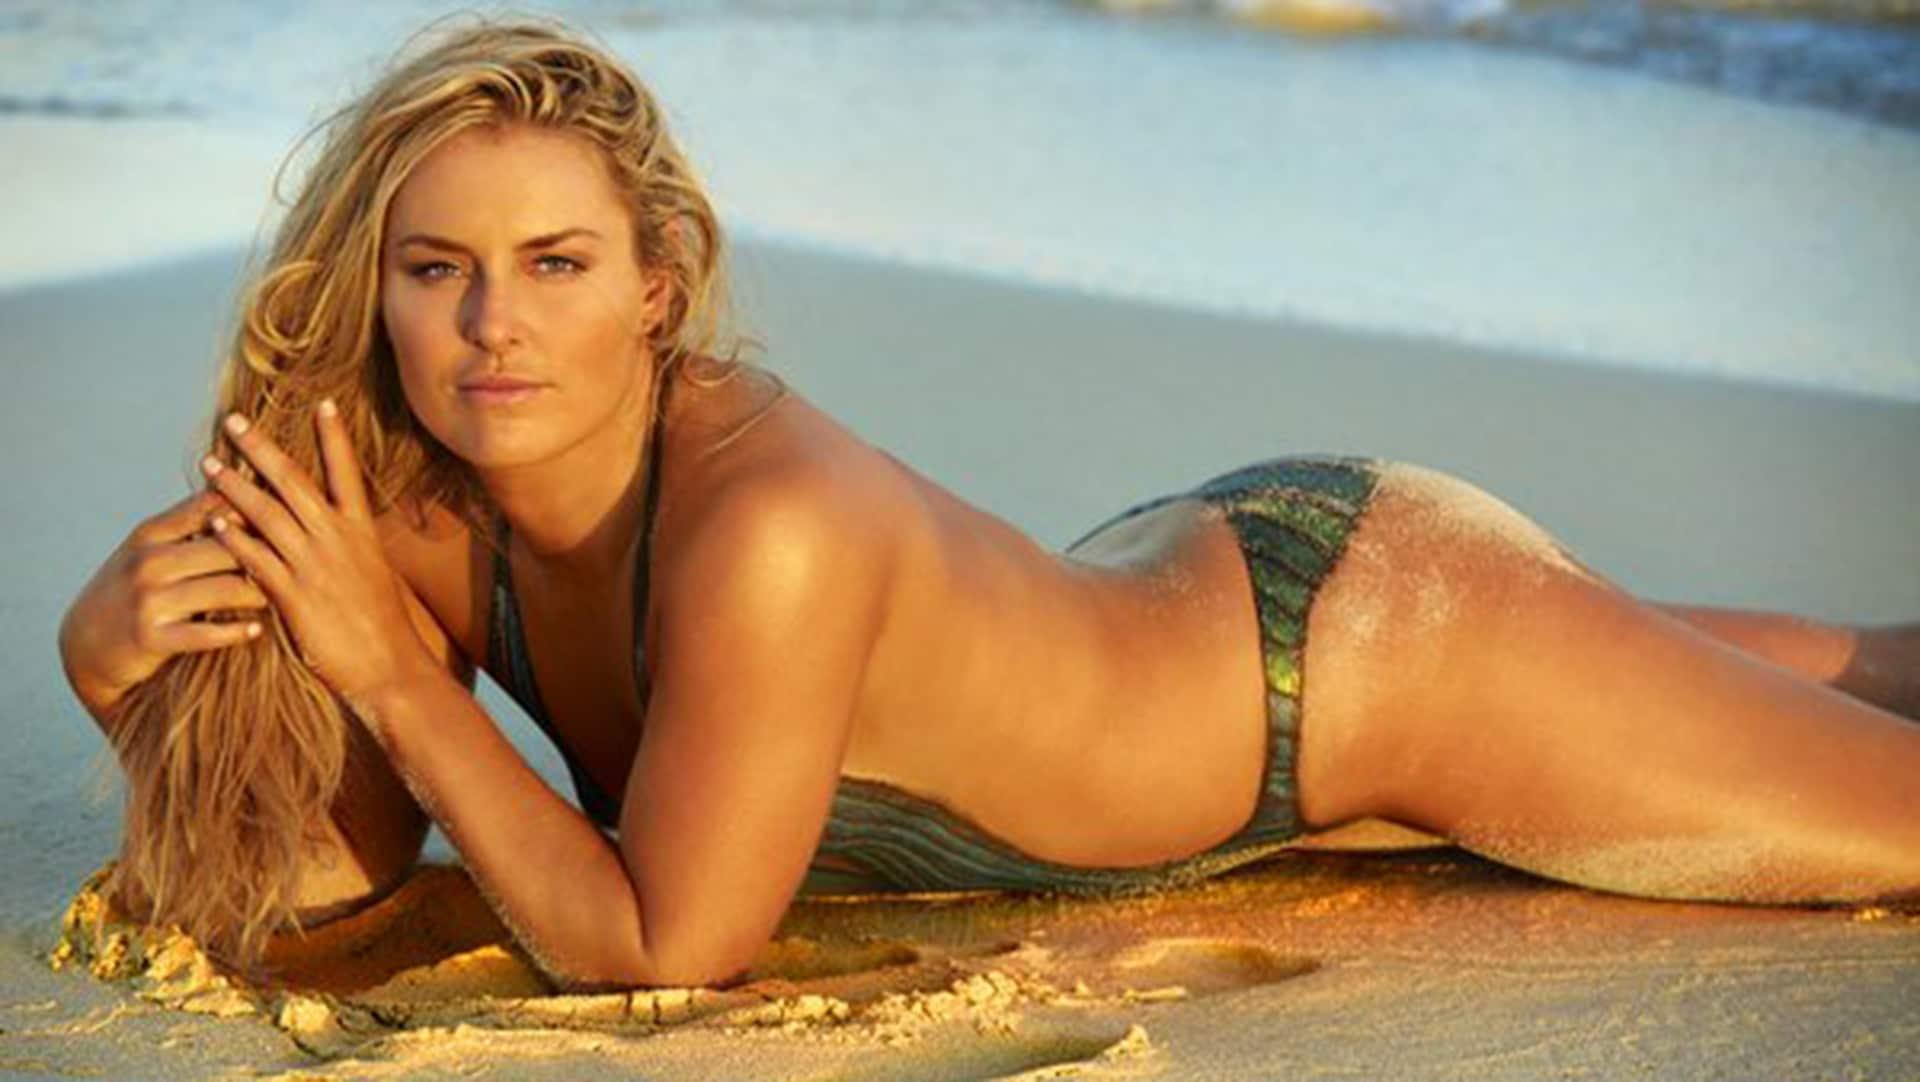 Photos: Caroline Wozniacki, Lindsay Vonn In Body Paint In Sports Illustrated Swimsuit Edition ...